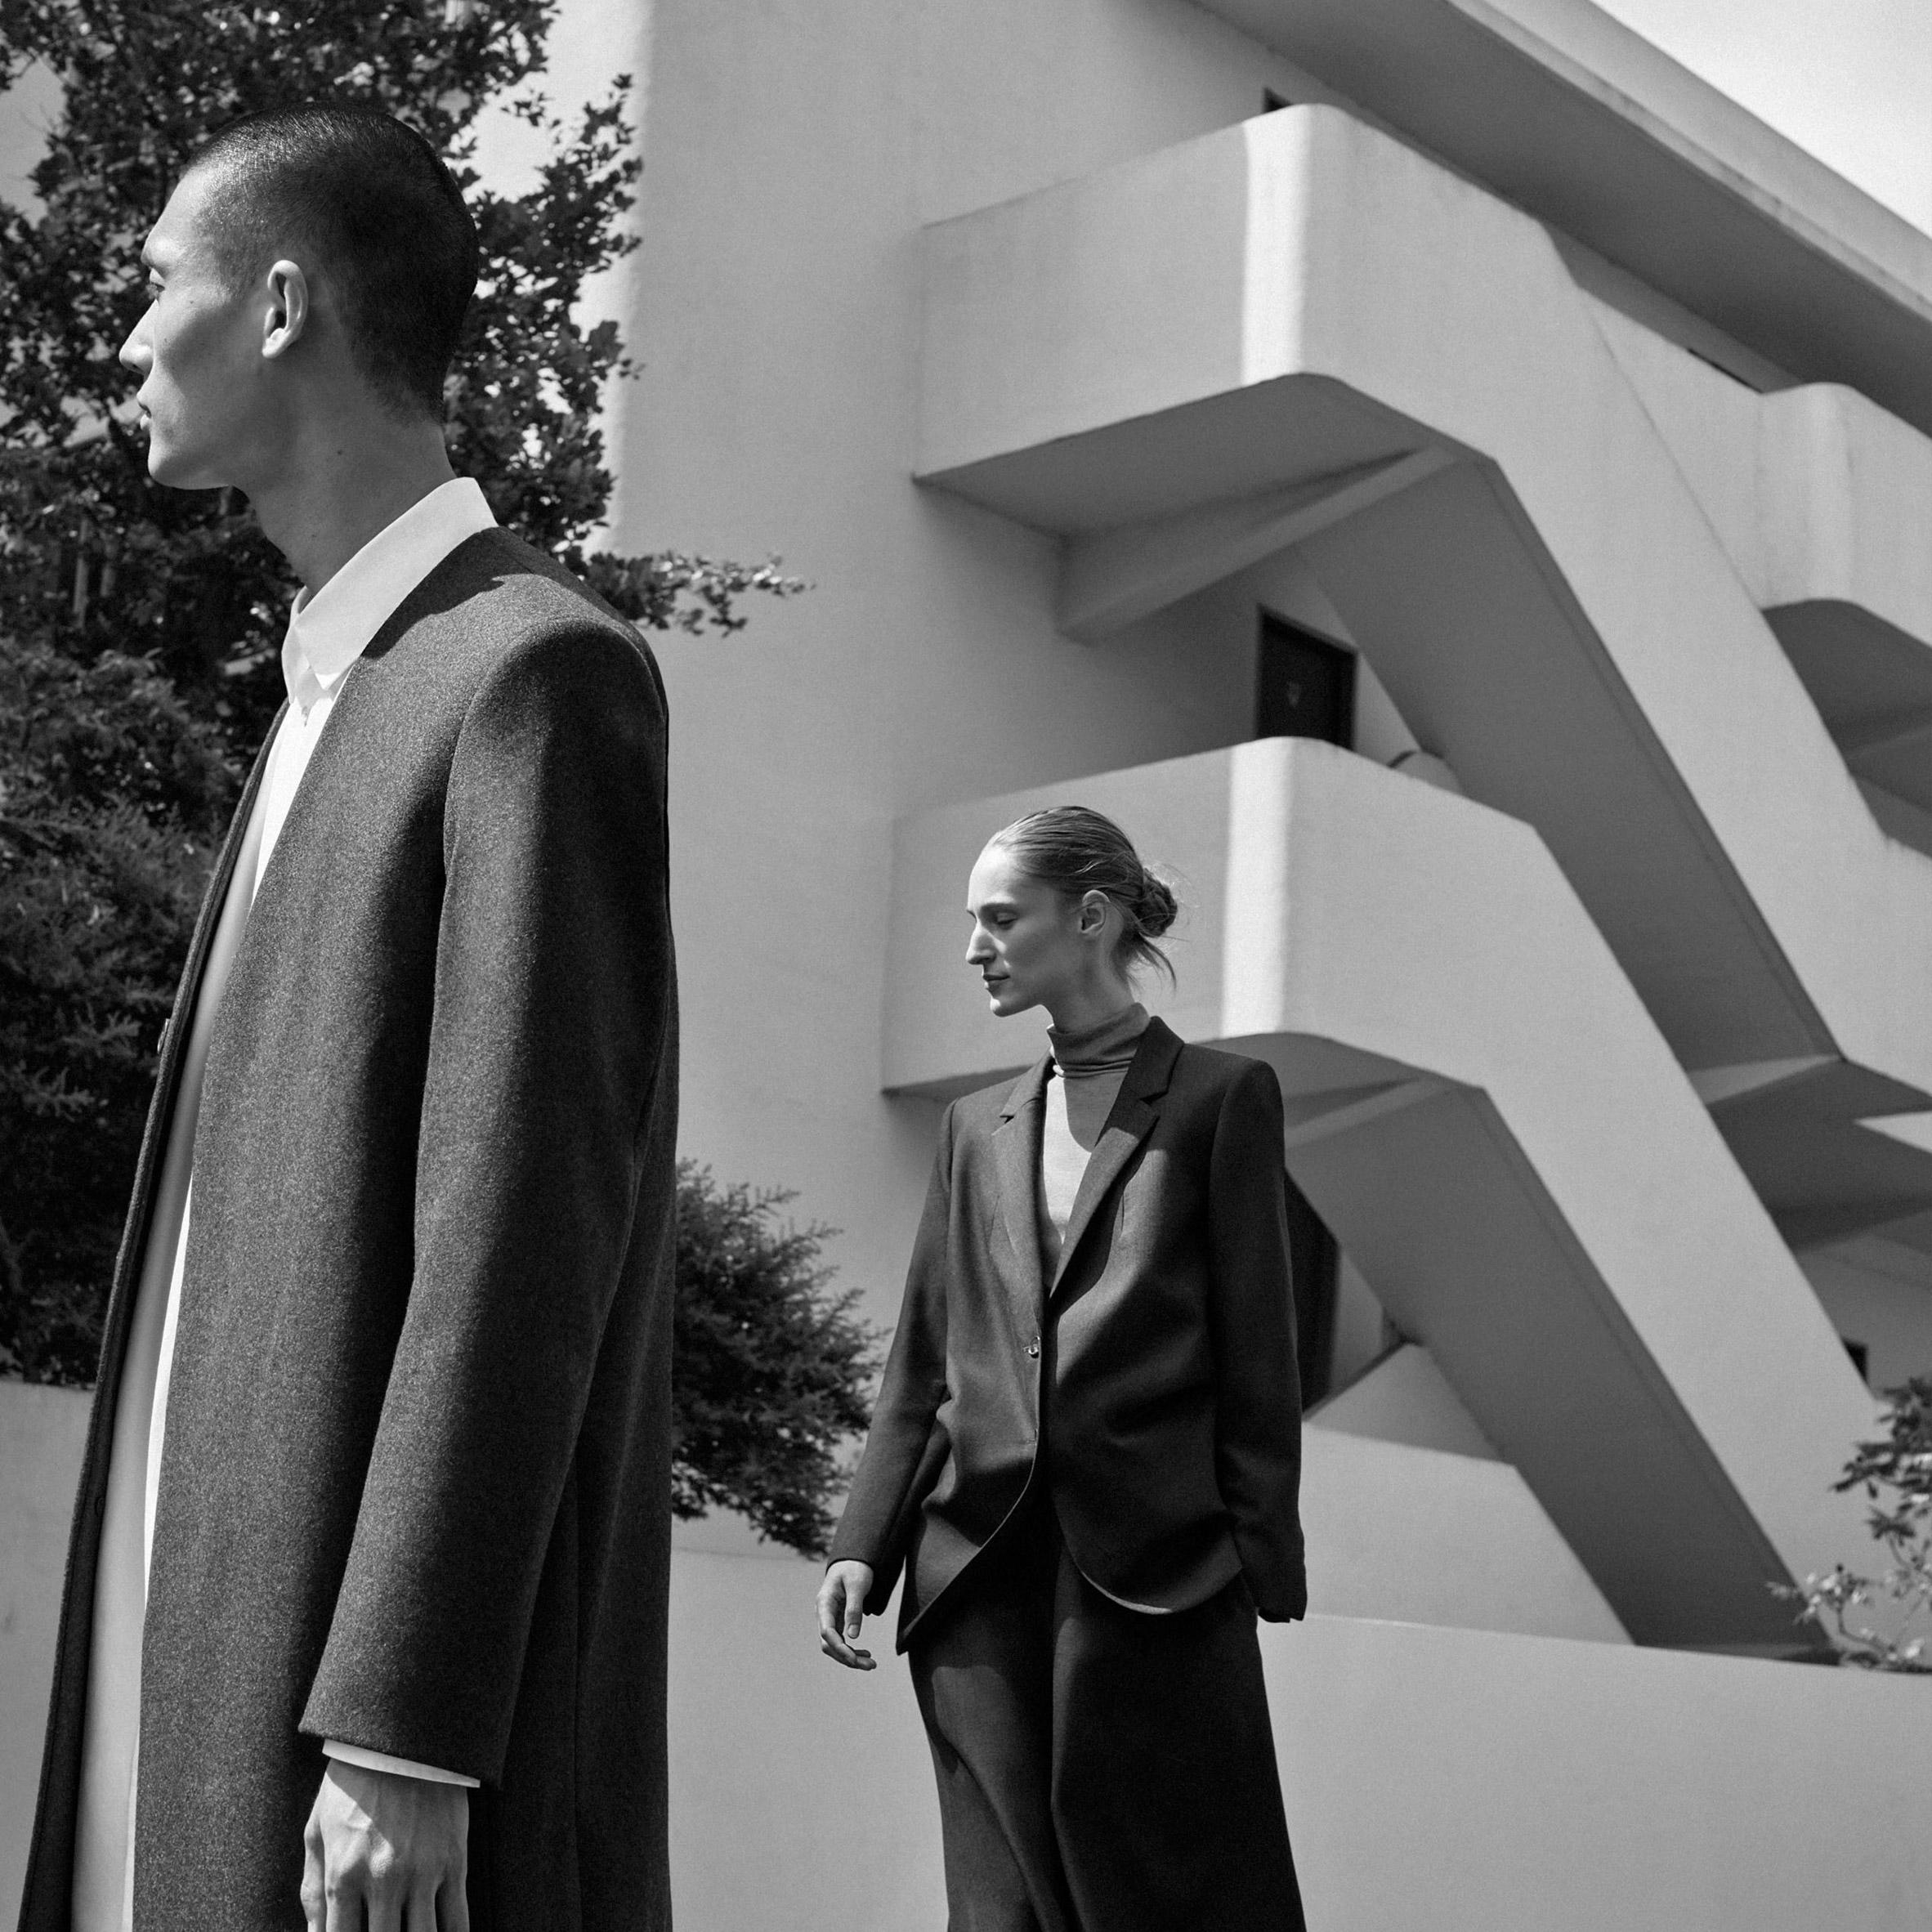 COS unveils fashion collection based on Bauhaus design principles thumbnail